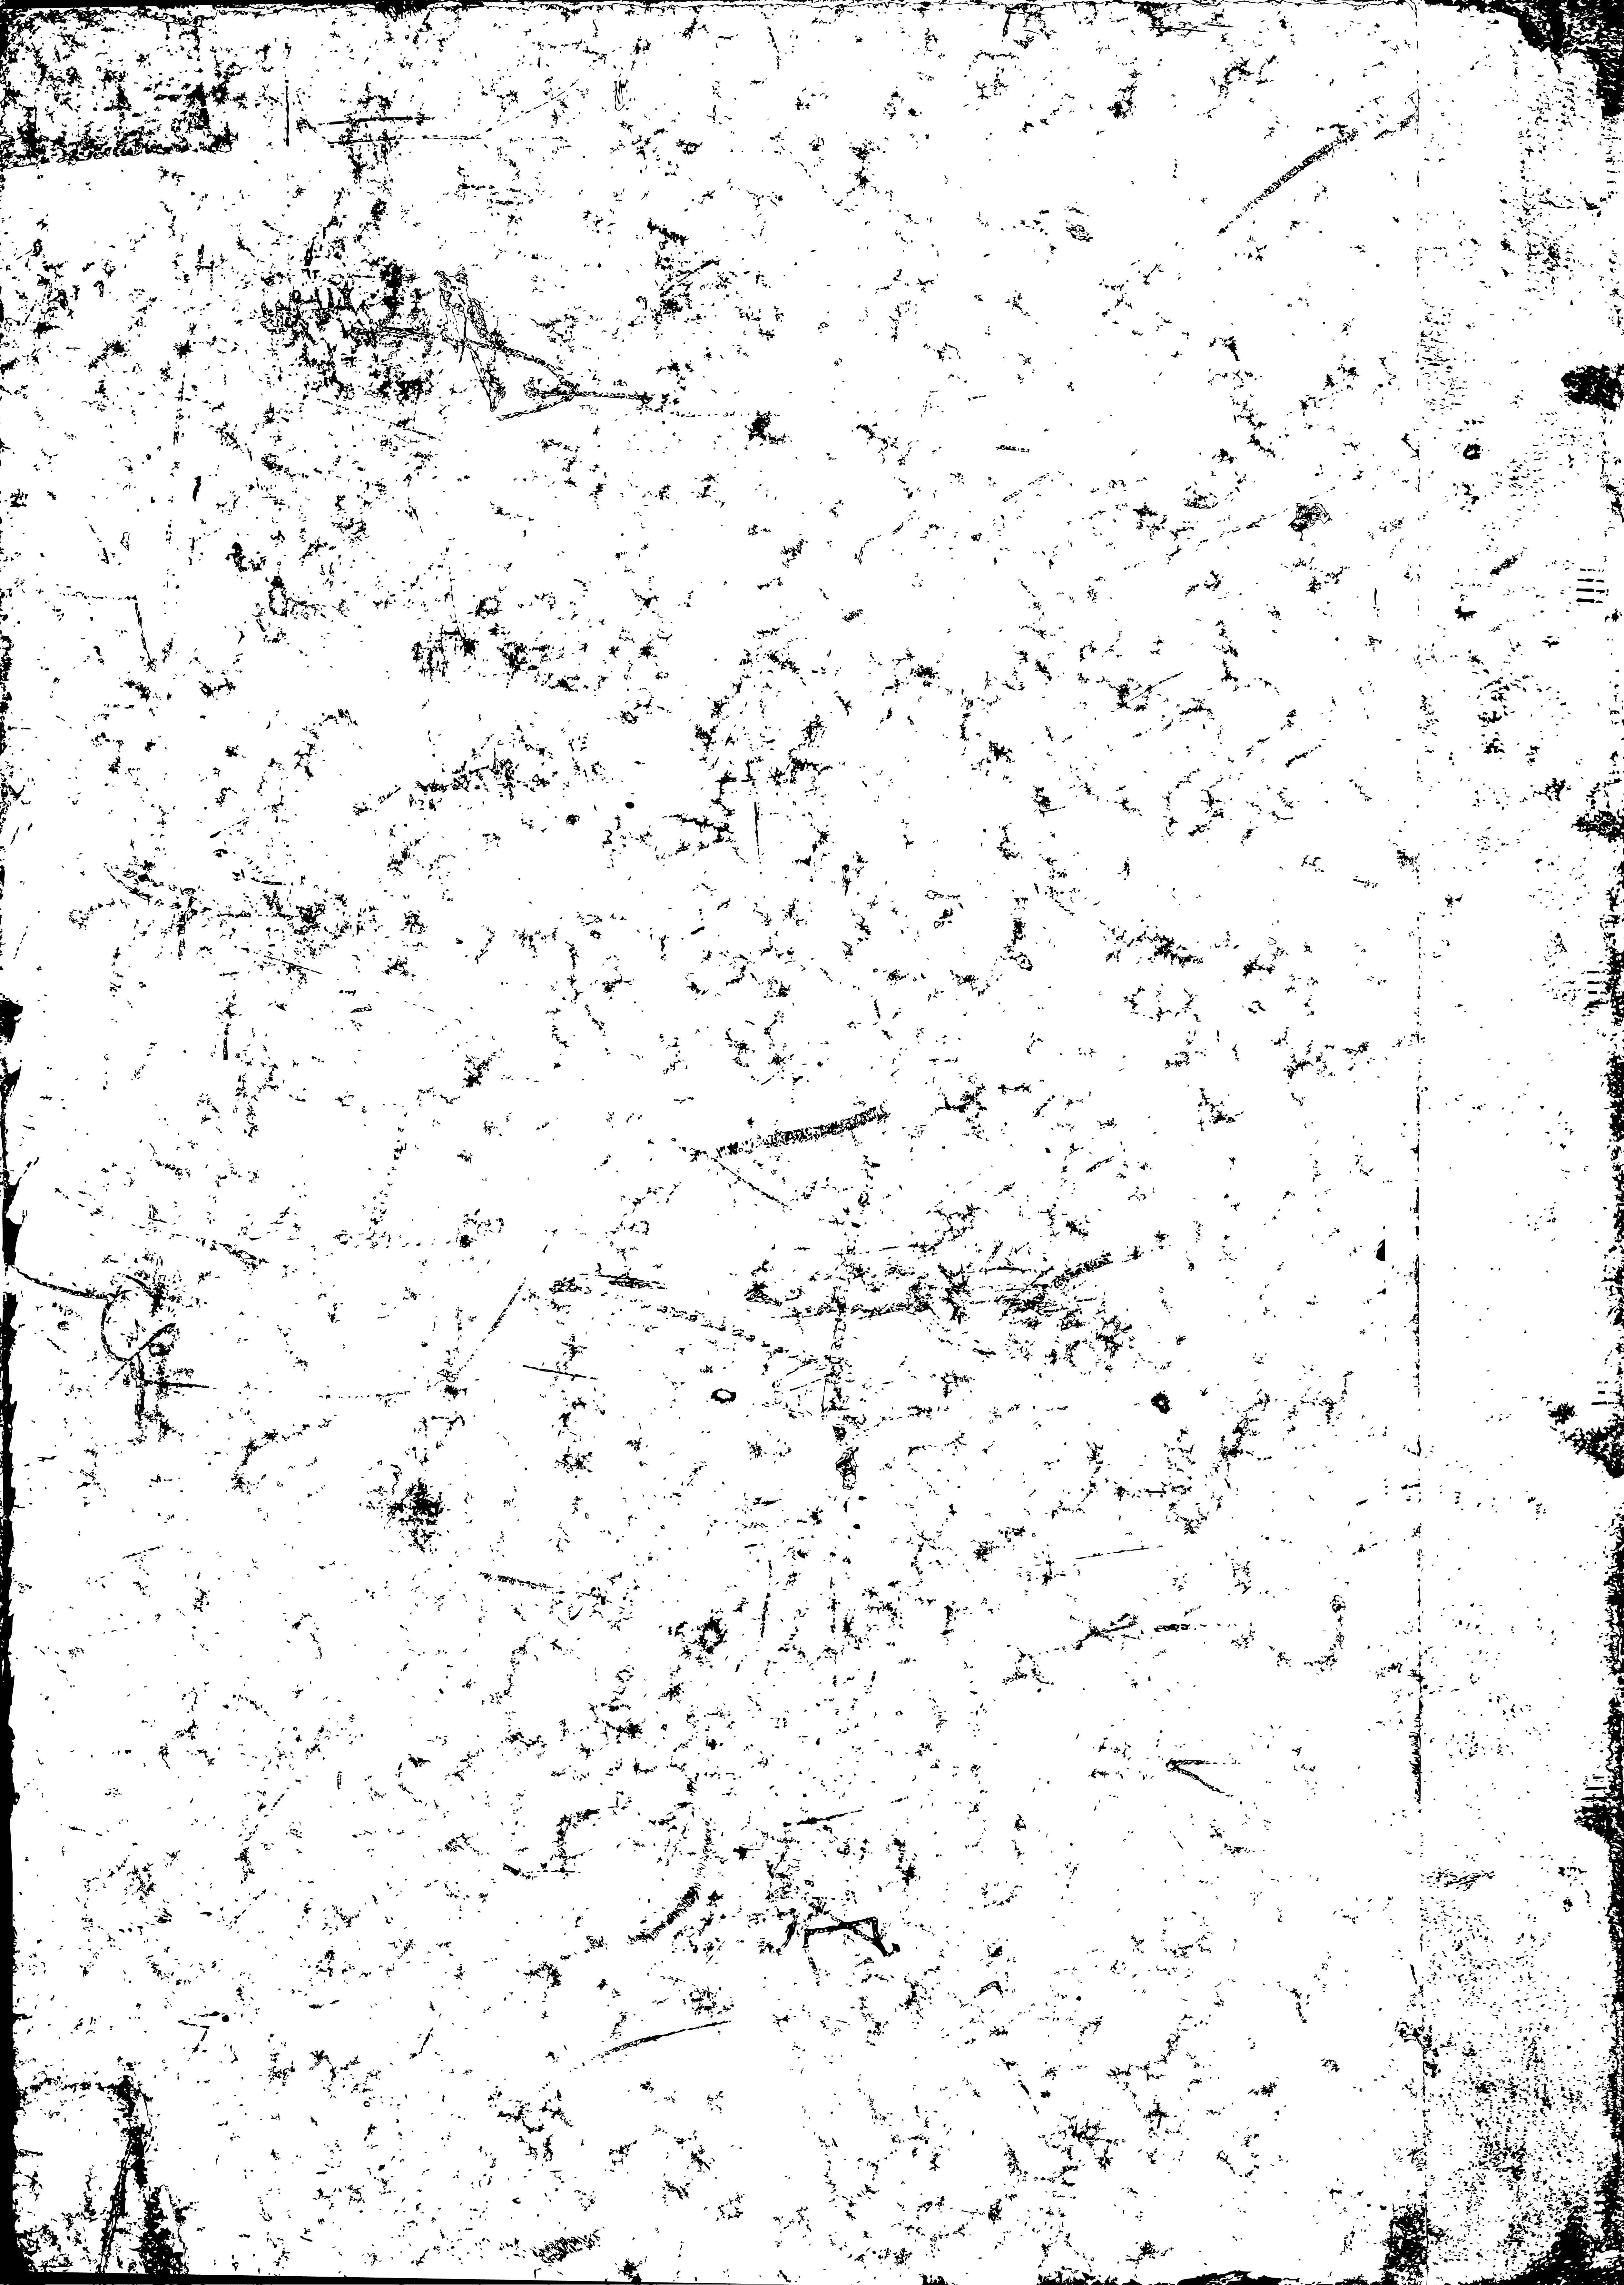 Grunge Scratched Texture Background.